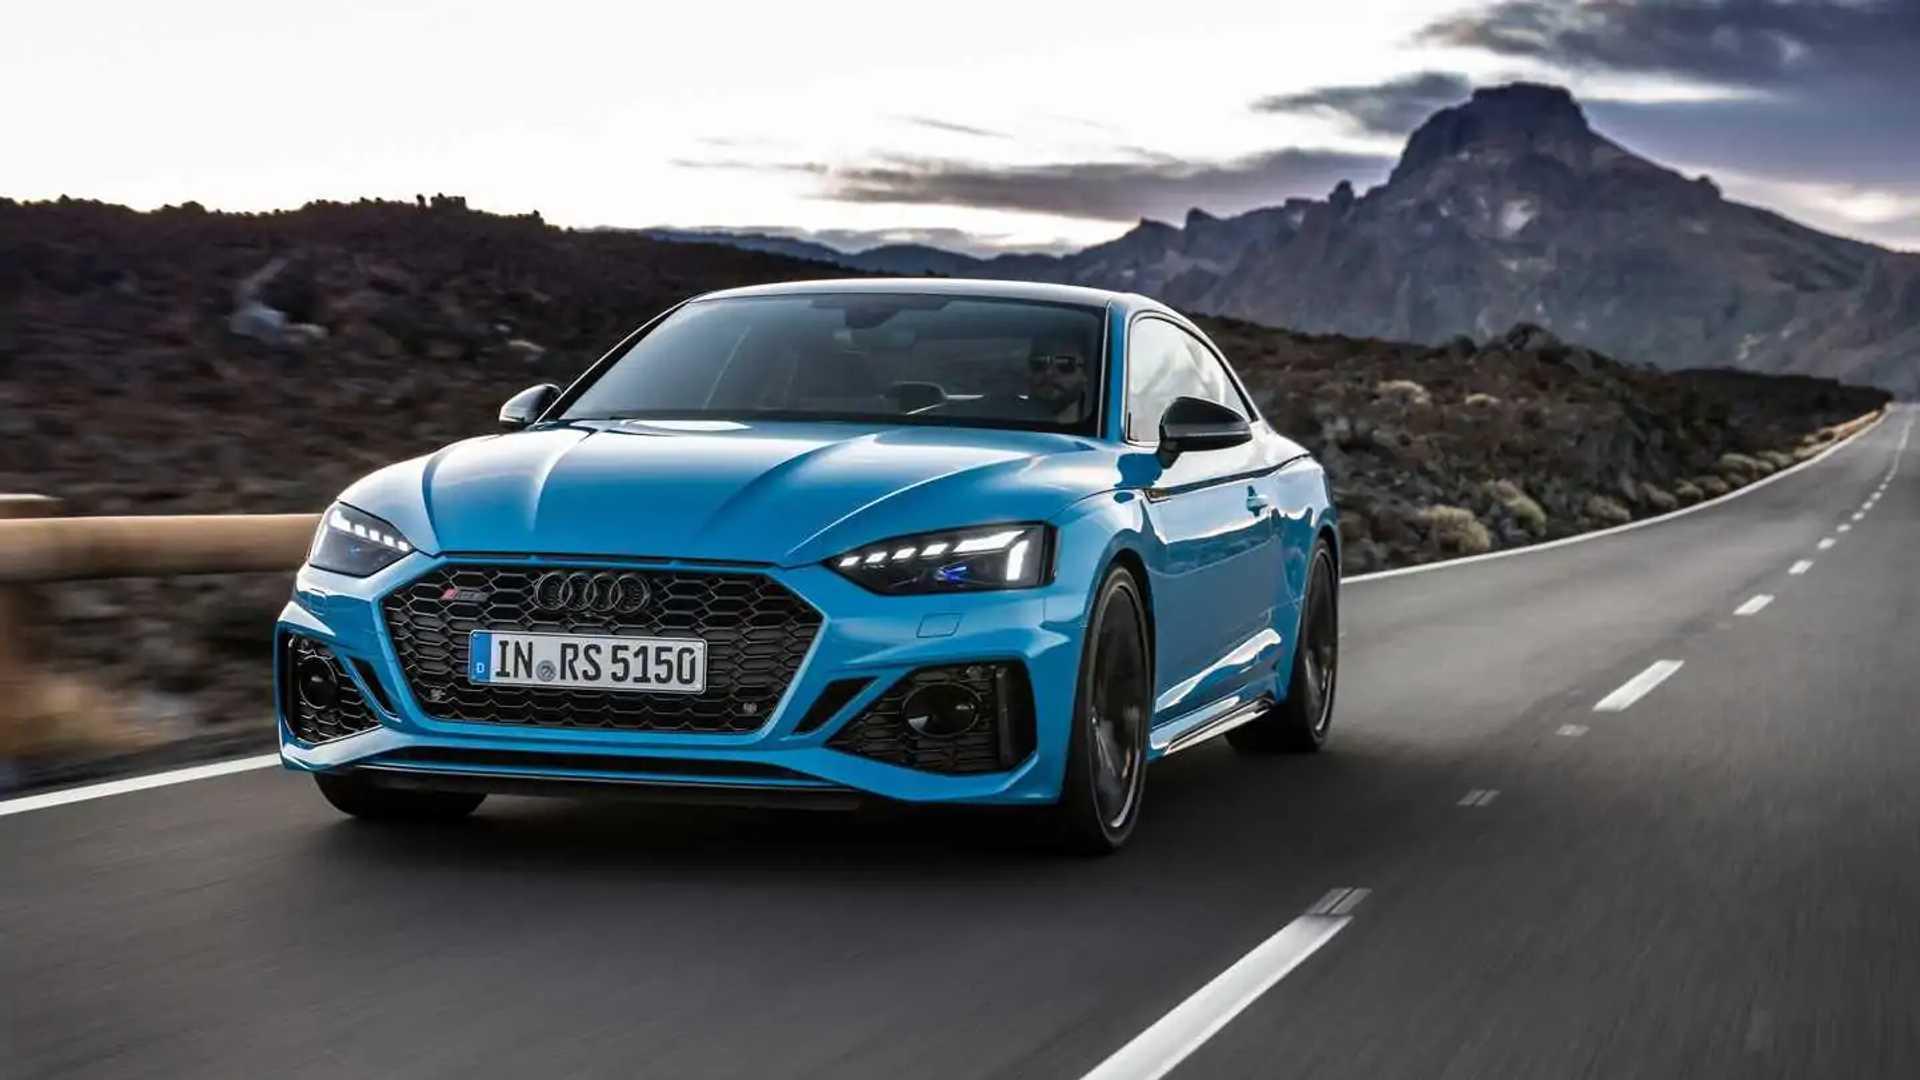 Audi Mmi Update >> Audi RS 5 und RS 5 Sportback Facelift: Neuer Look, gleiche Power